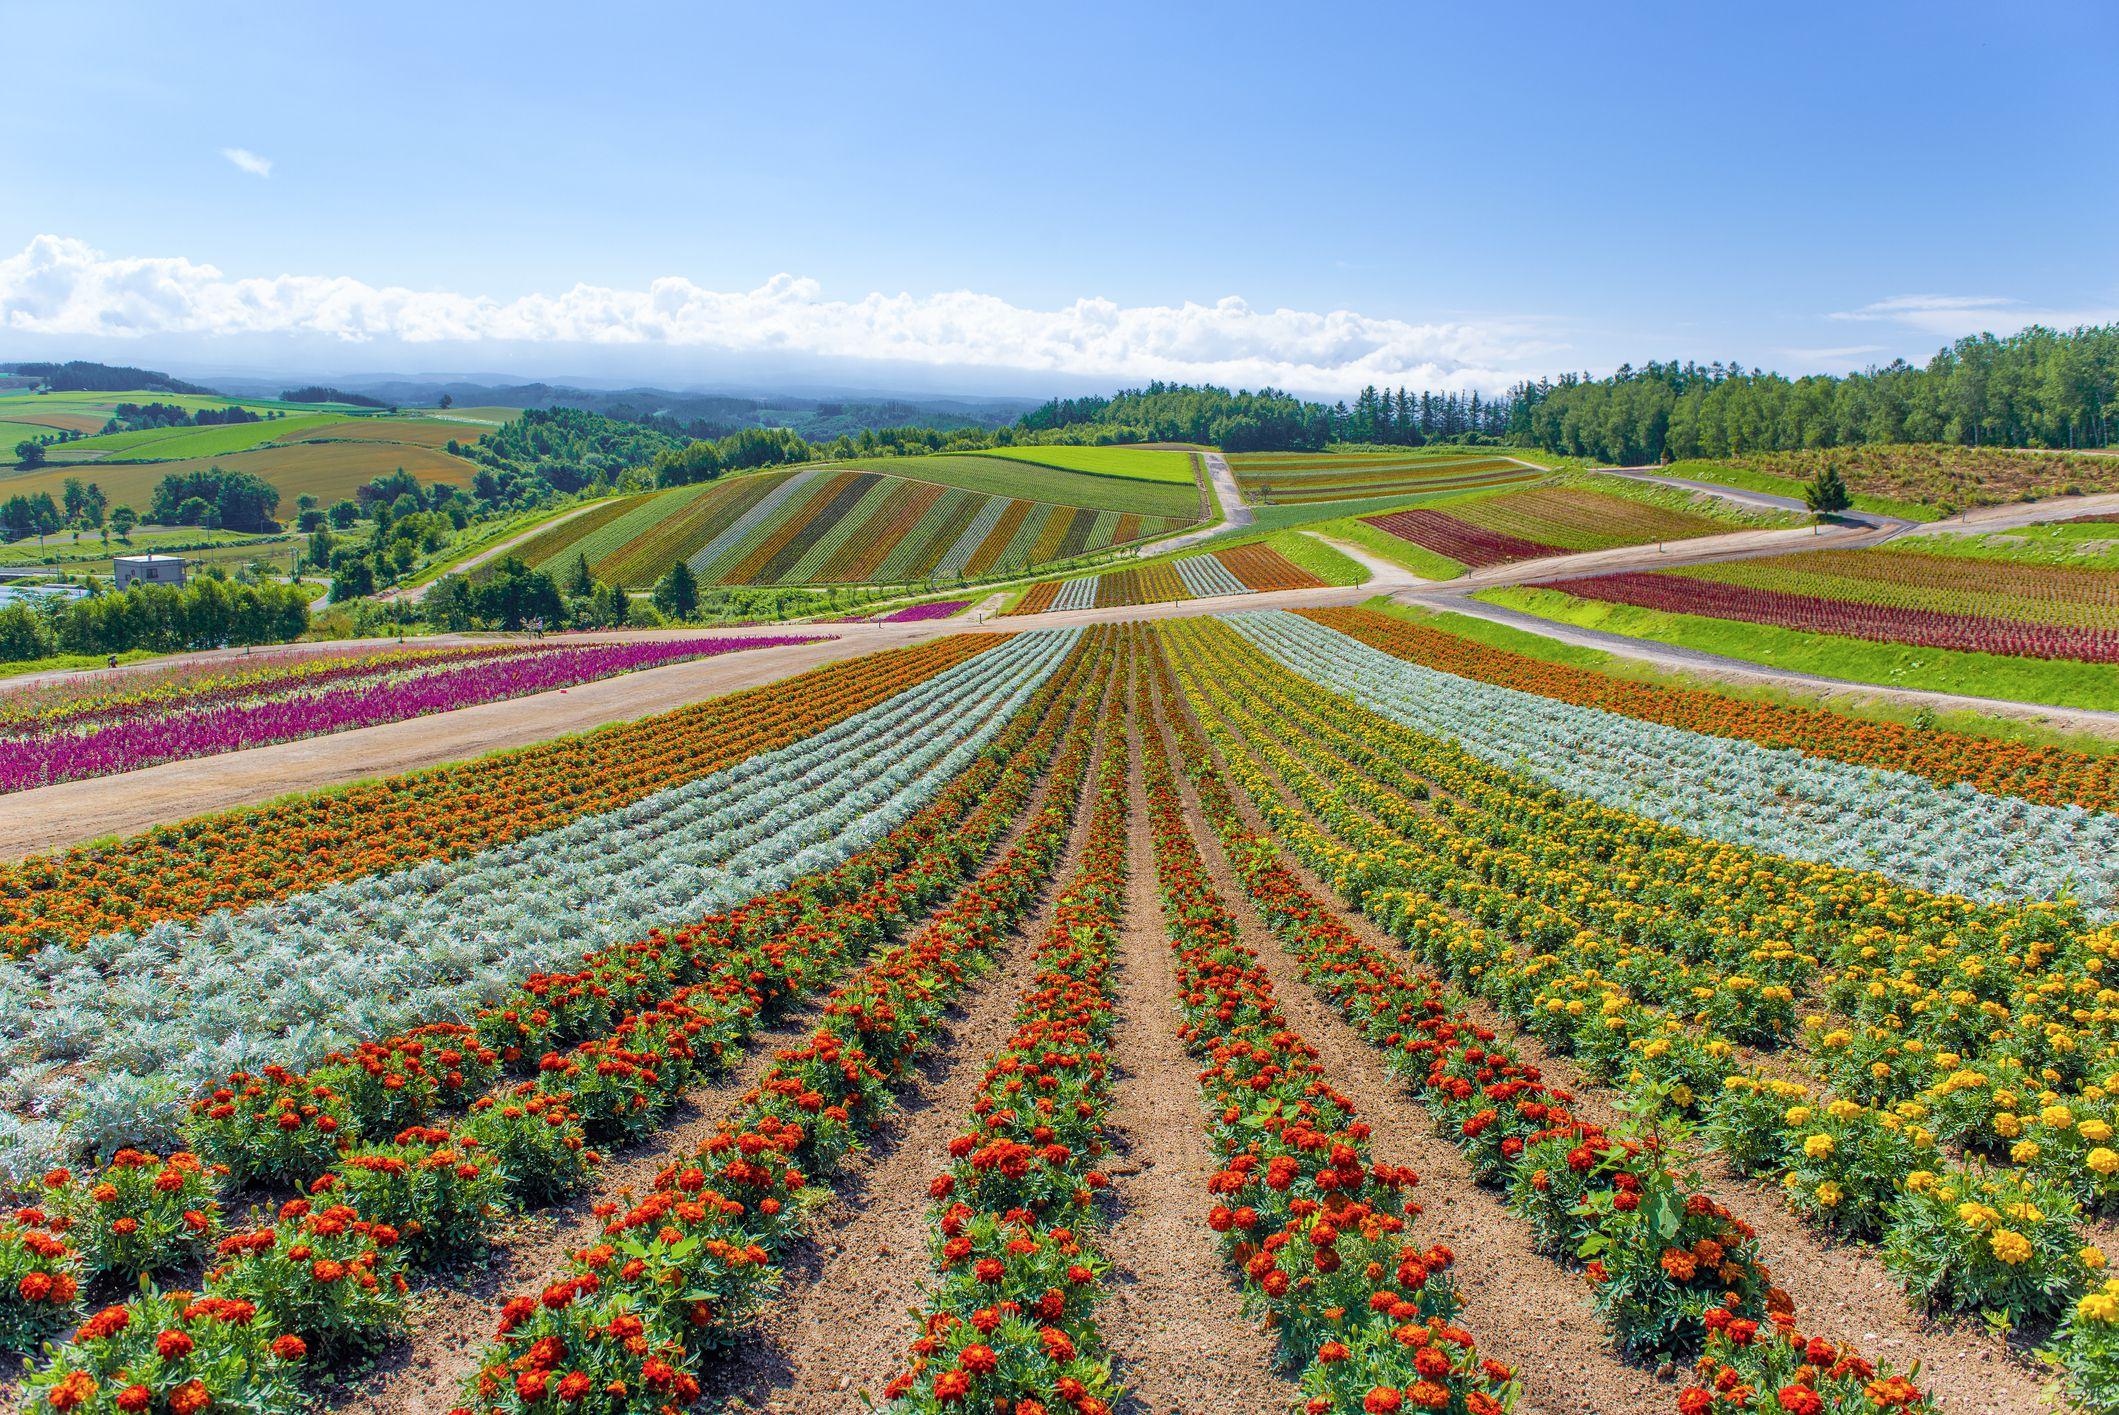 The Top 15 Things to Do in Hokkaido